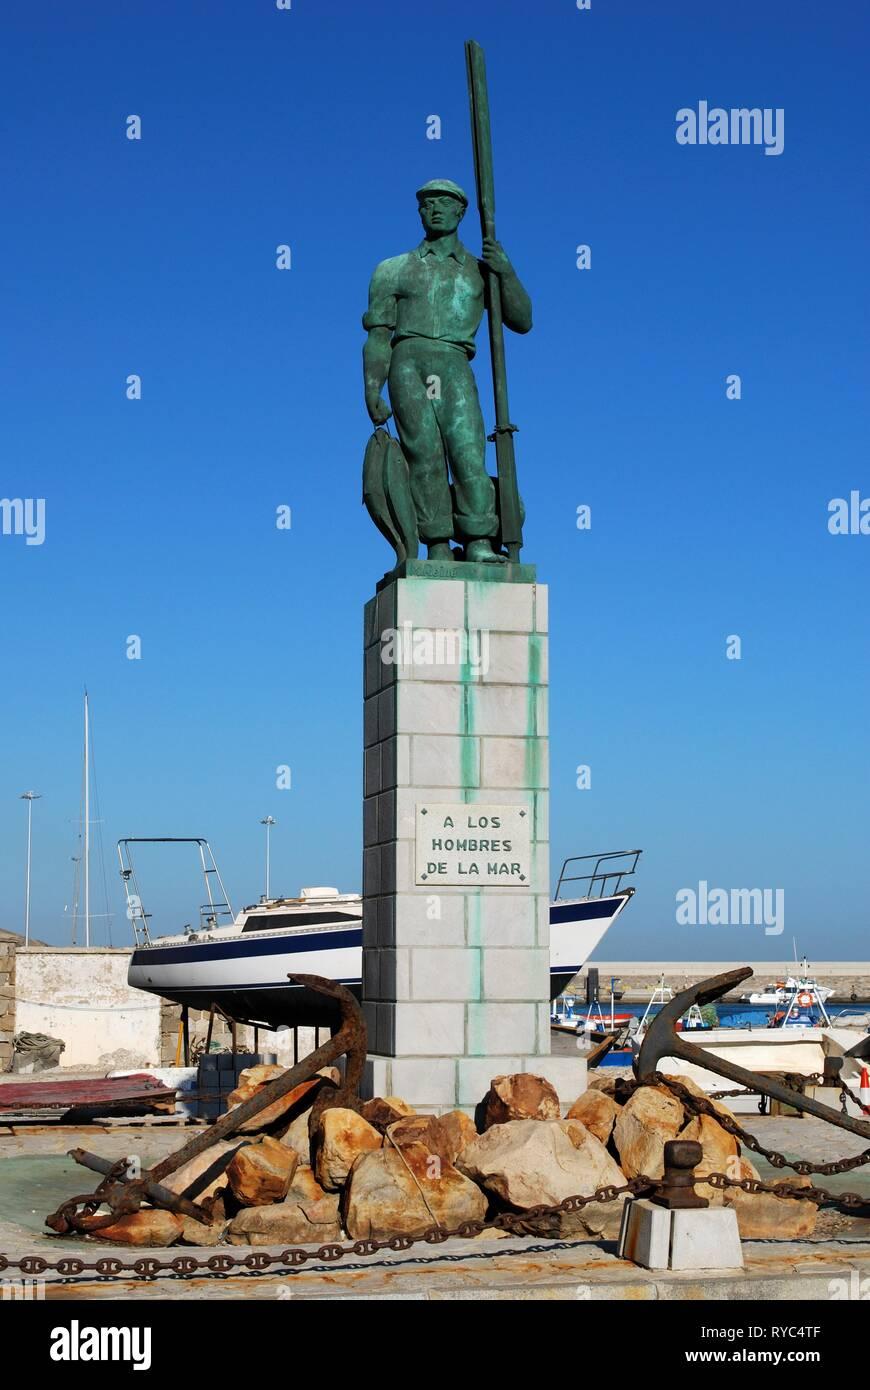 View of the fisherman statue in the port (A Los Hombres de la Mar), Tarifa, Cadiz Province, Andalusia, Spain, Europe. - Stock Image